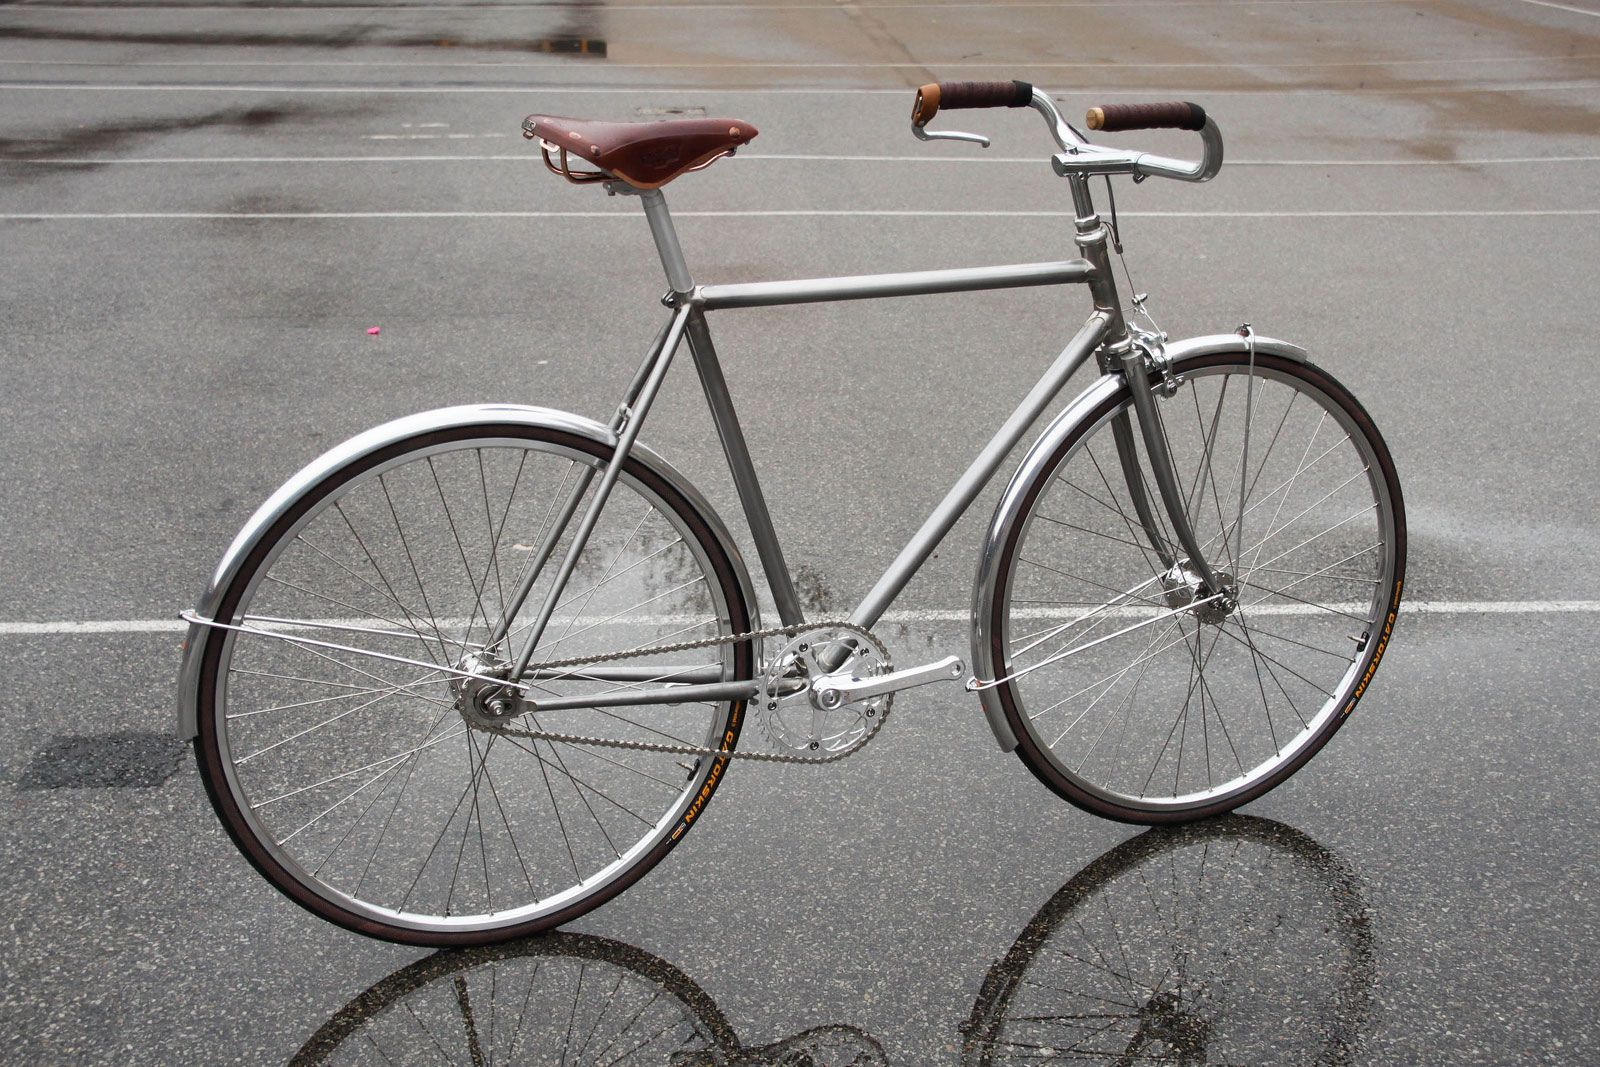 August Bicycles Commuter Bike Bicycle Bike Commuter Bike